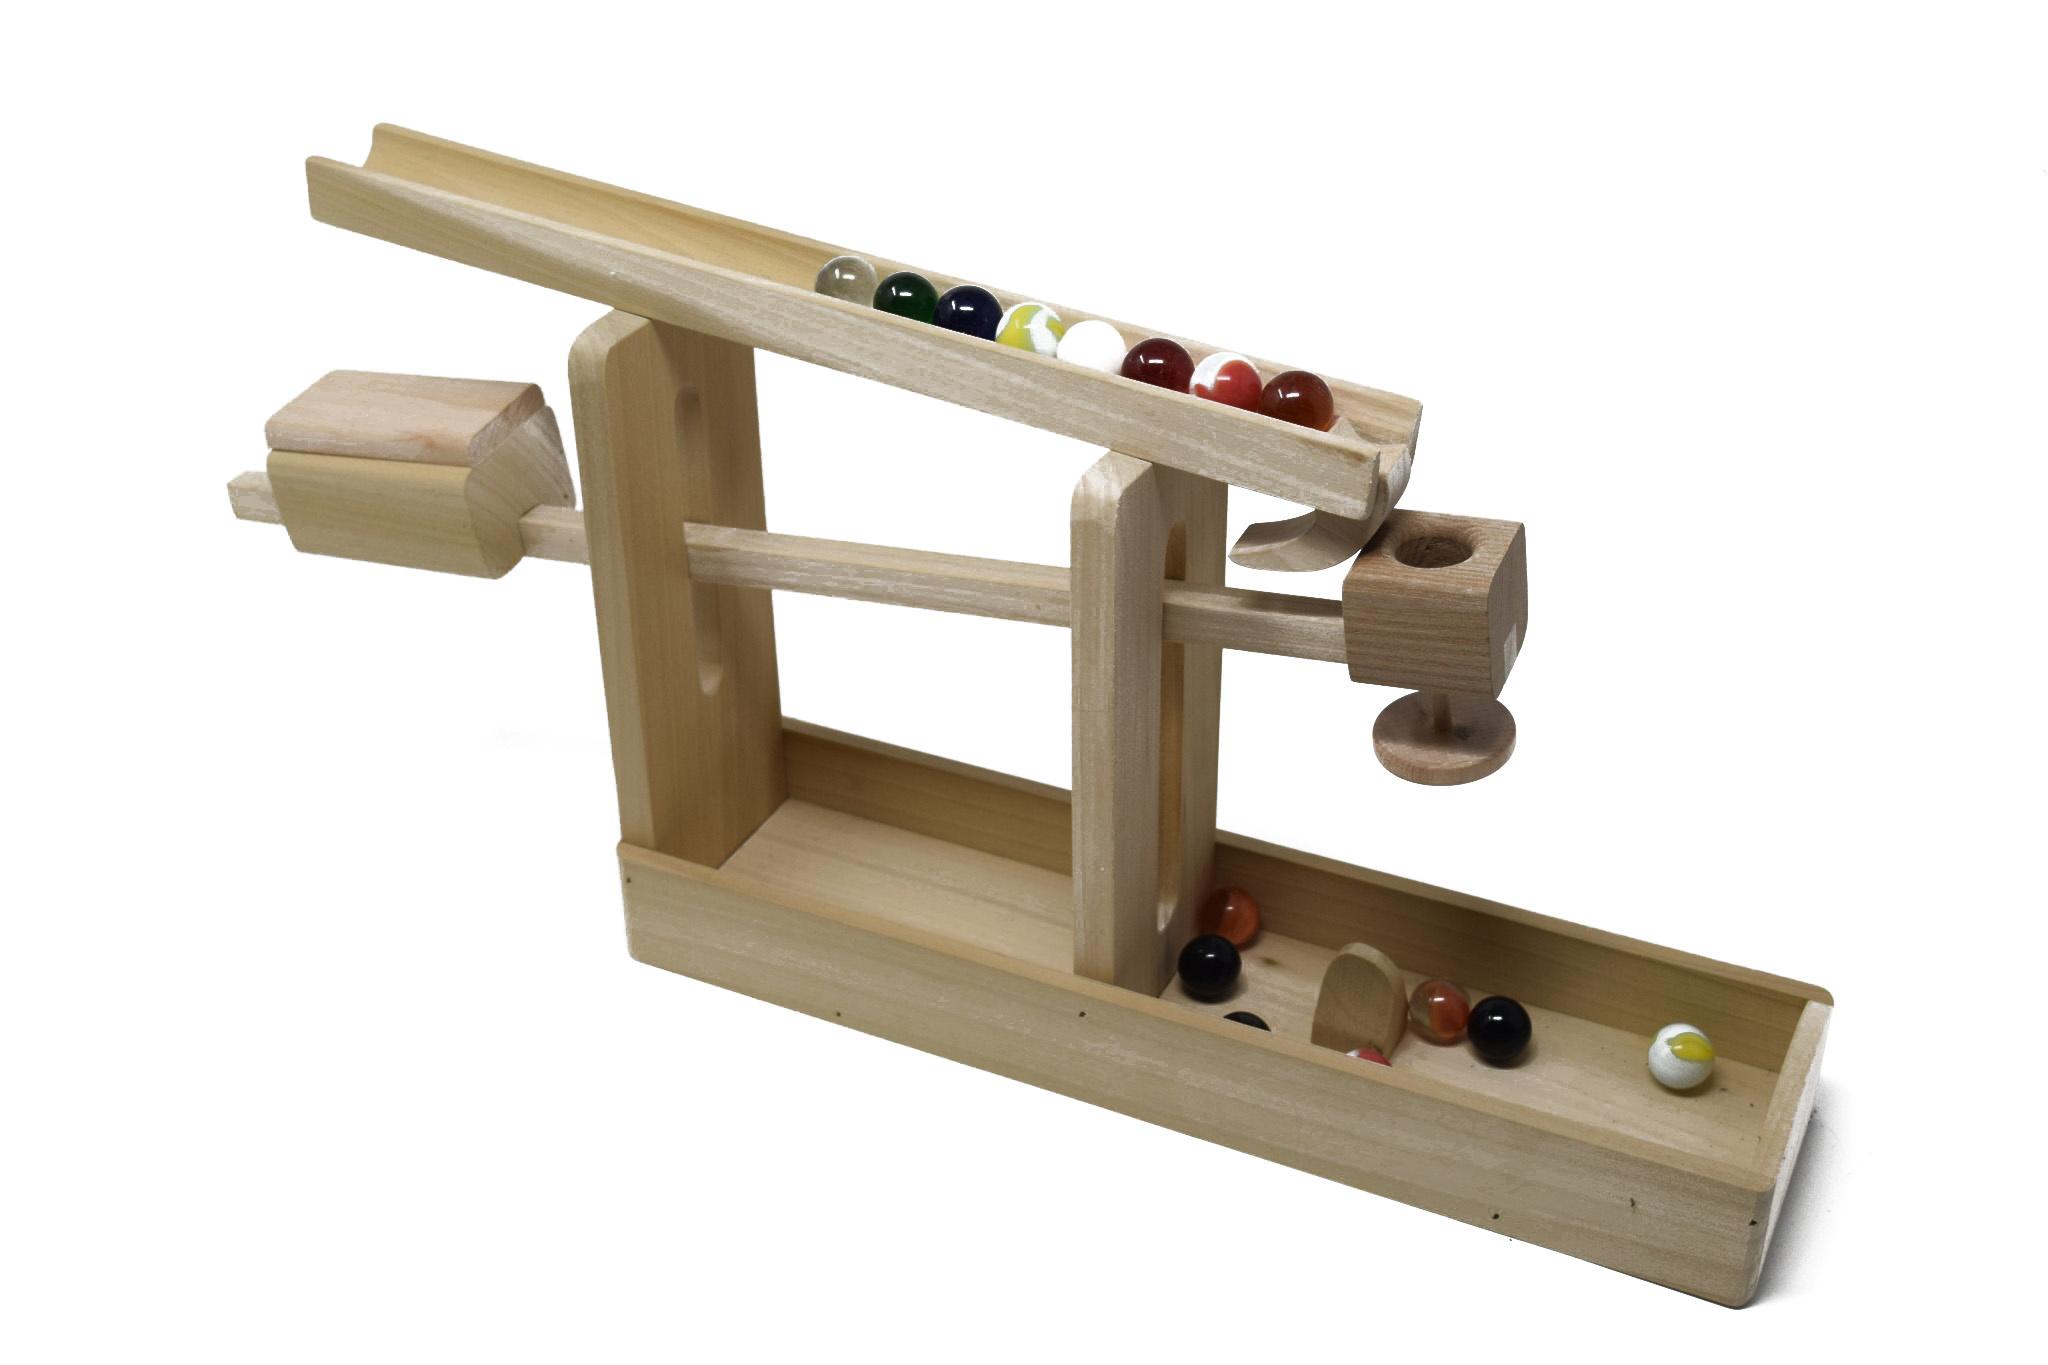 Wooden Marble Roller Machine Toy-1